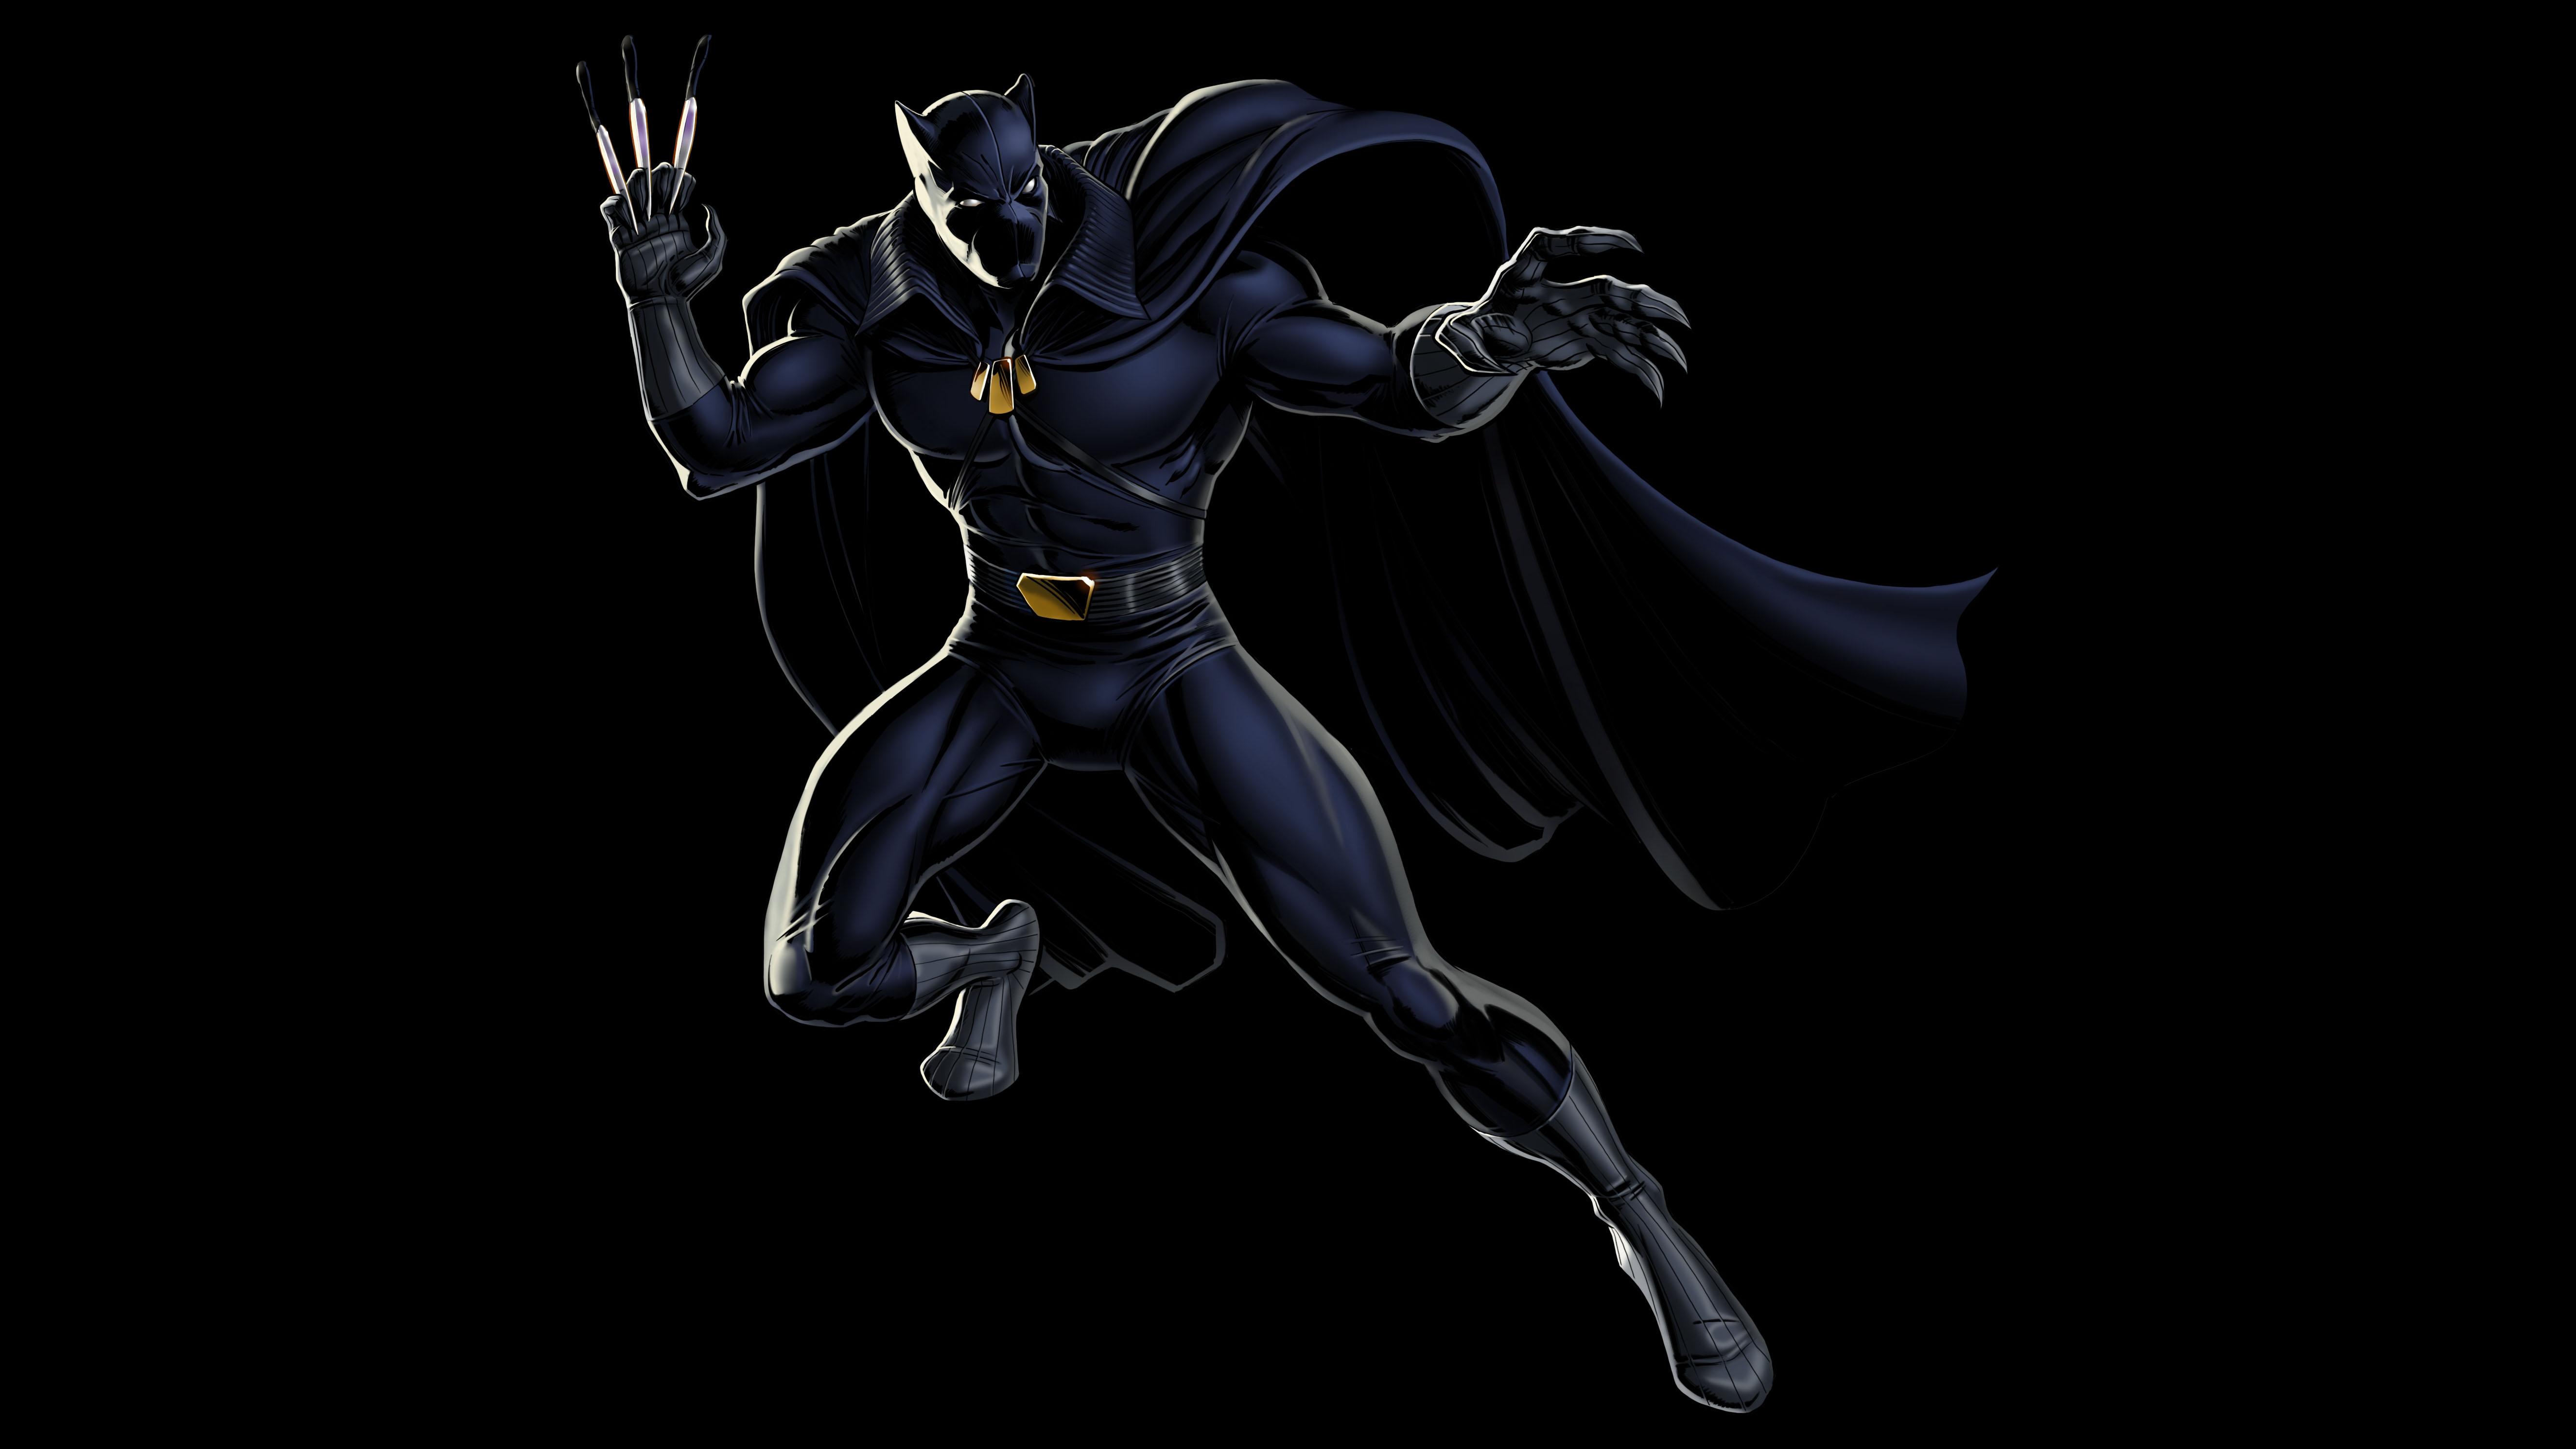 Black Panther Comic Wallpaper: Marvel Black Panther Wallpaper Desktop